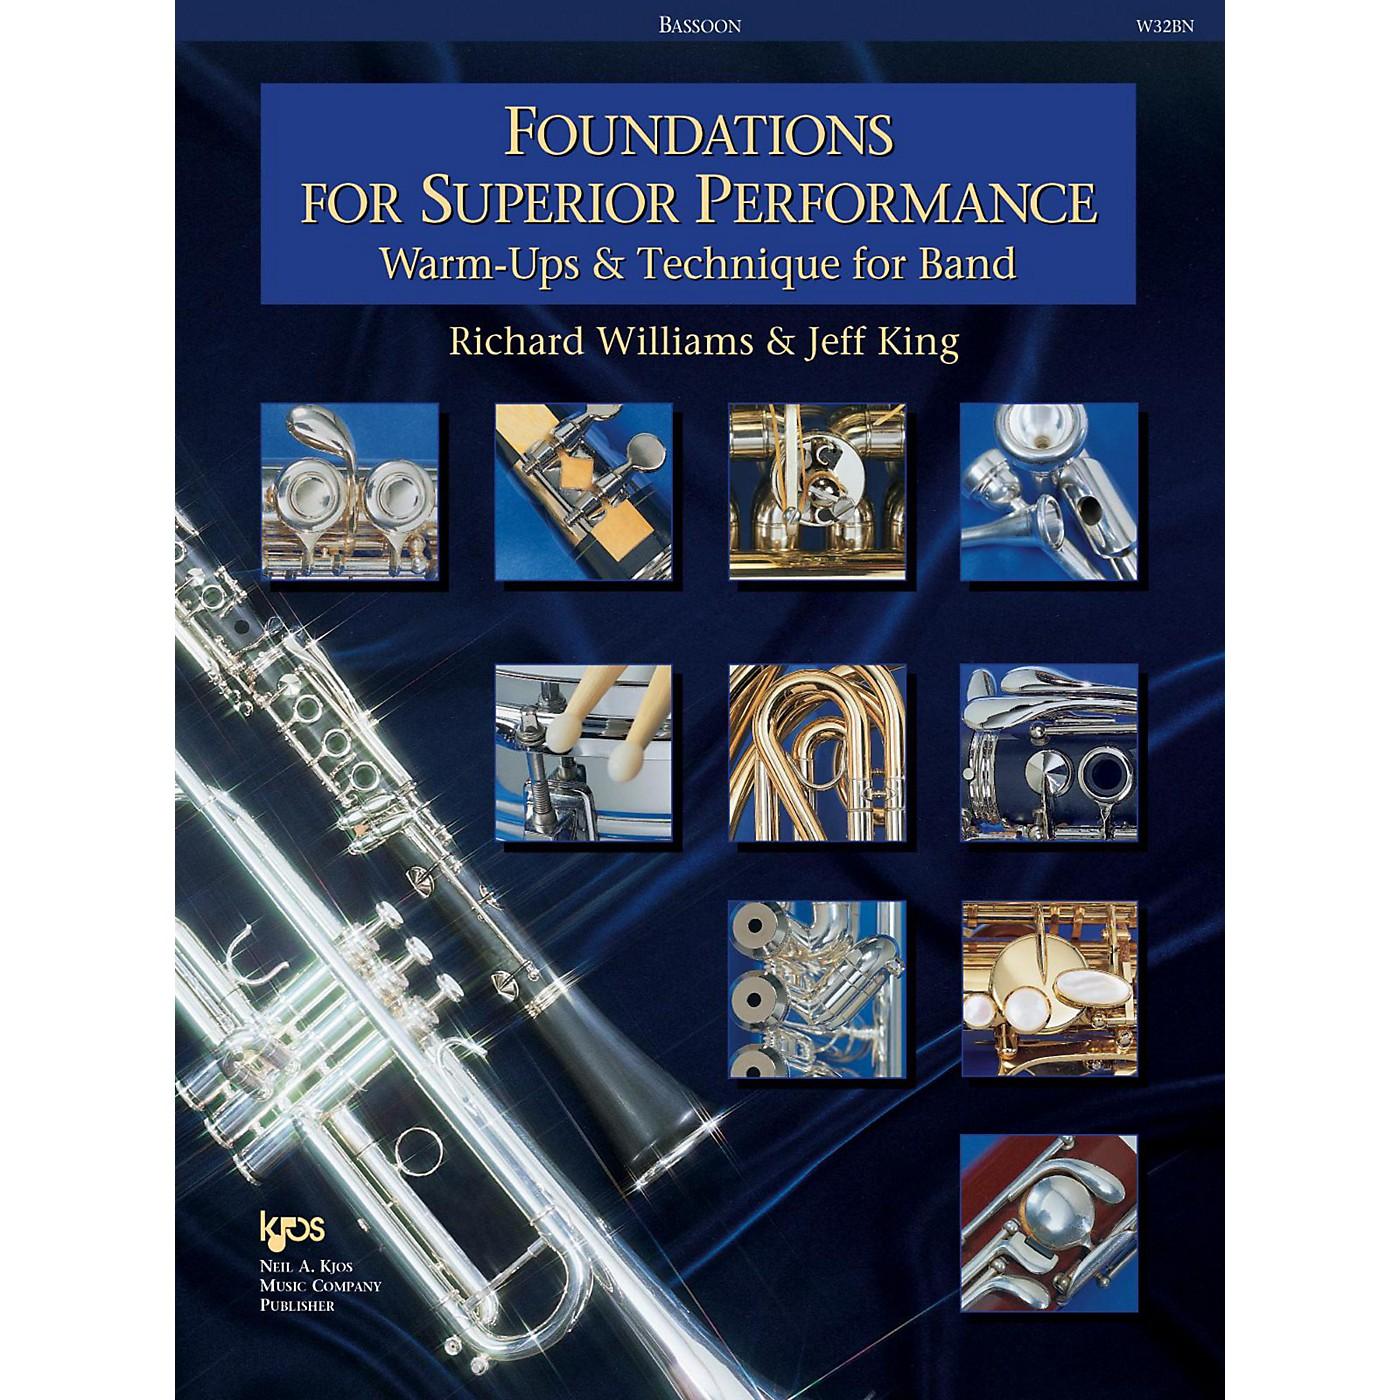 KJOS Foundations for Superior Performance Bassoon thumbnail